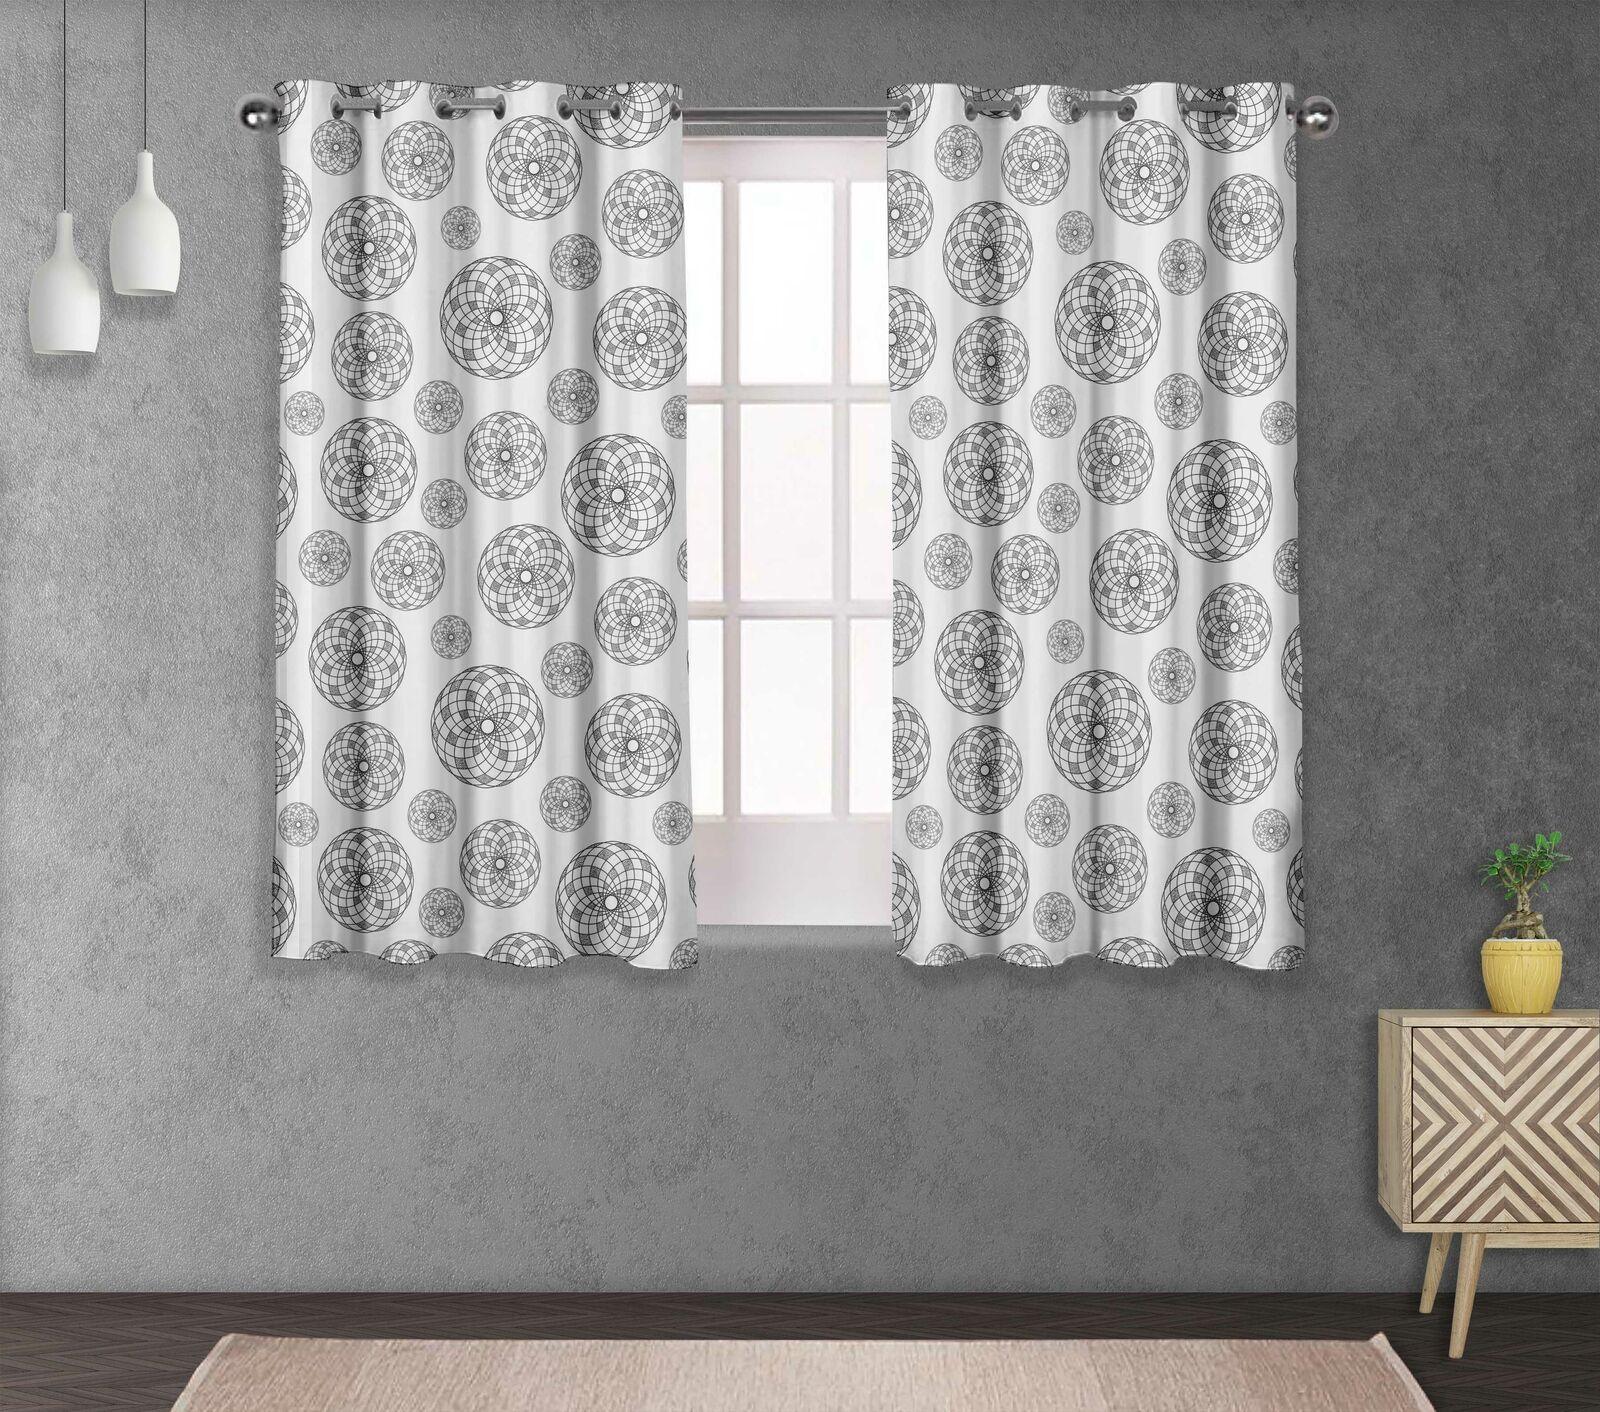 S4sassy Concentric Mandala Window short & long Curtain Eyelet  Drapers-GMD-569M